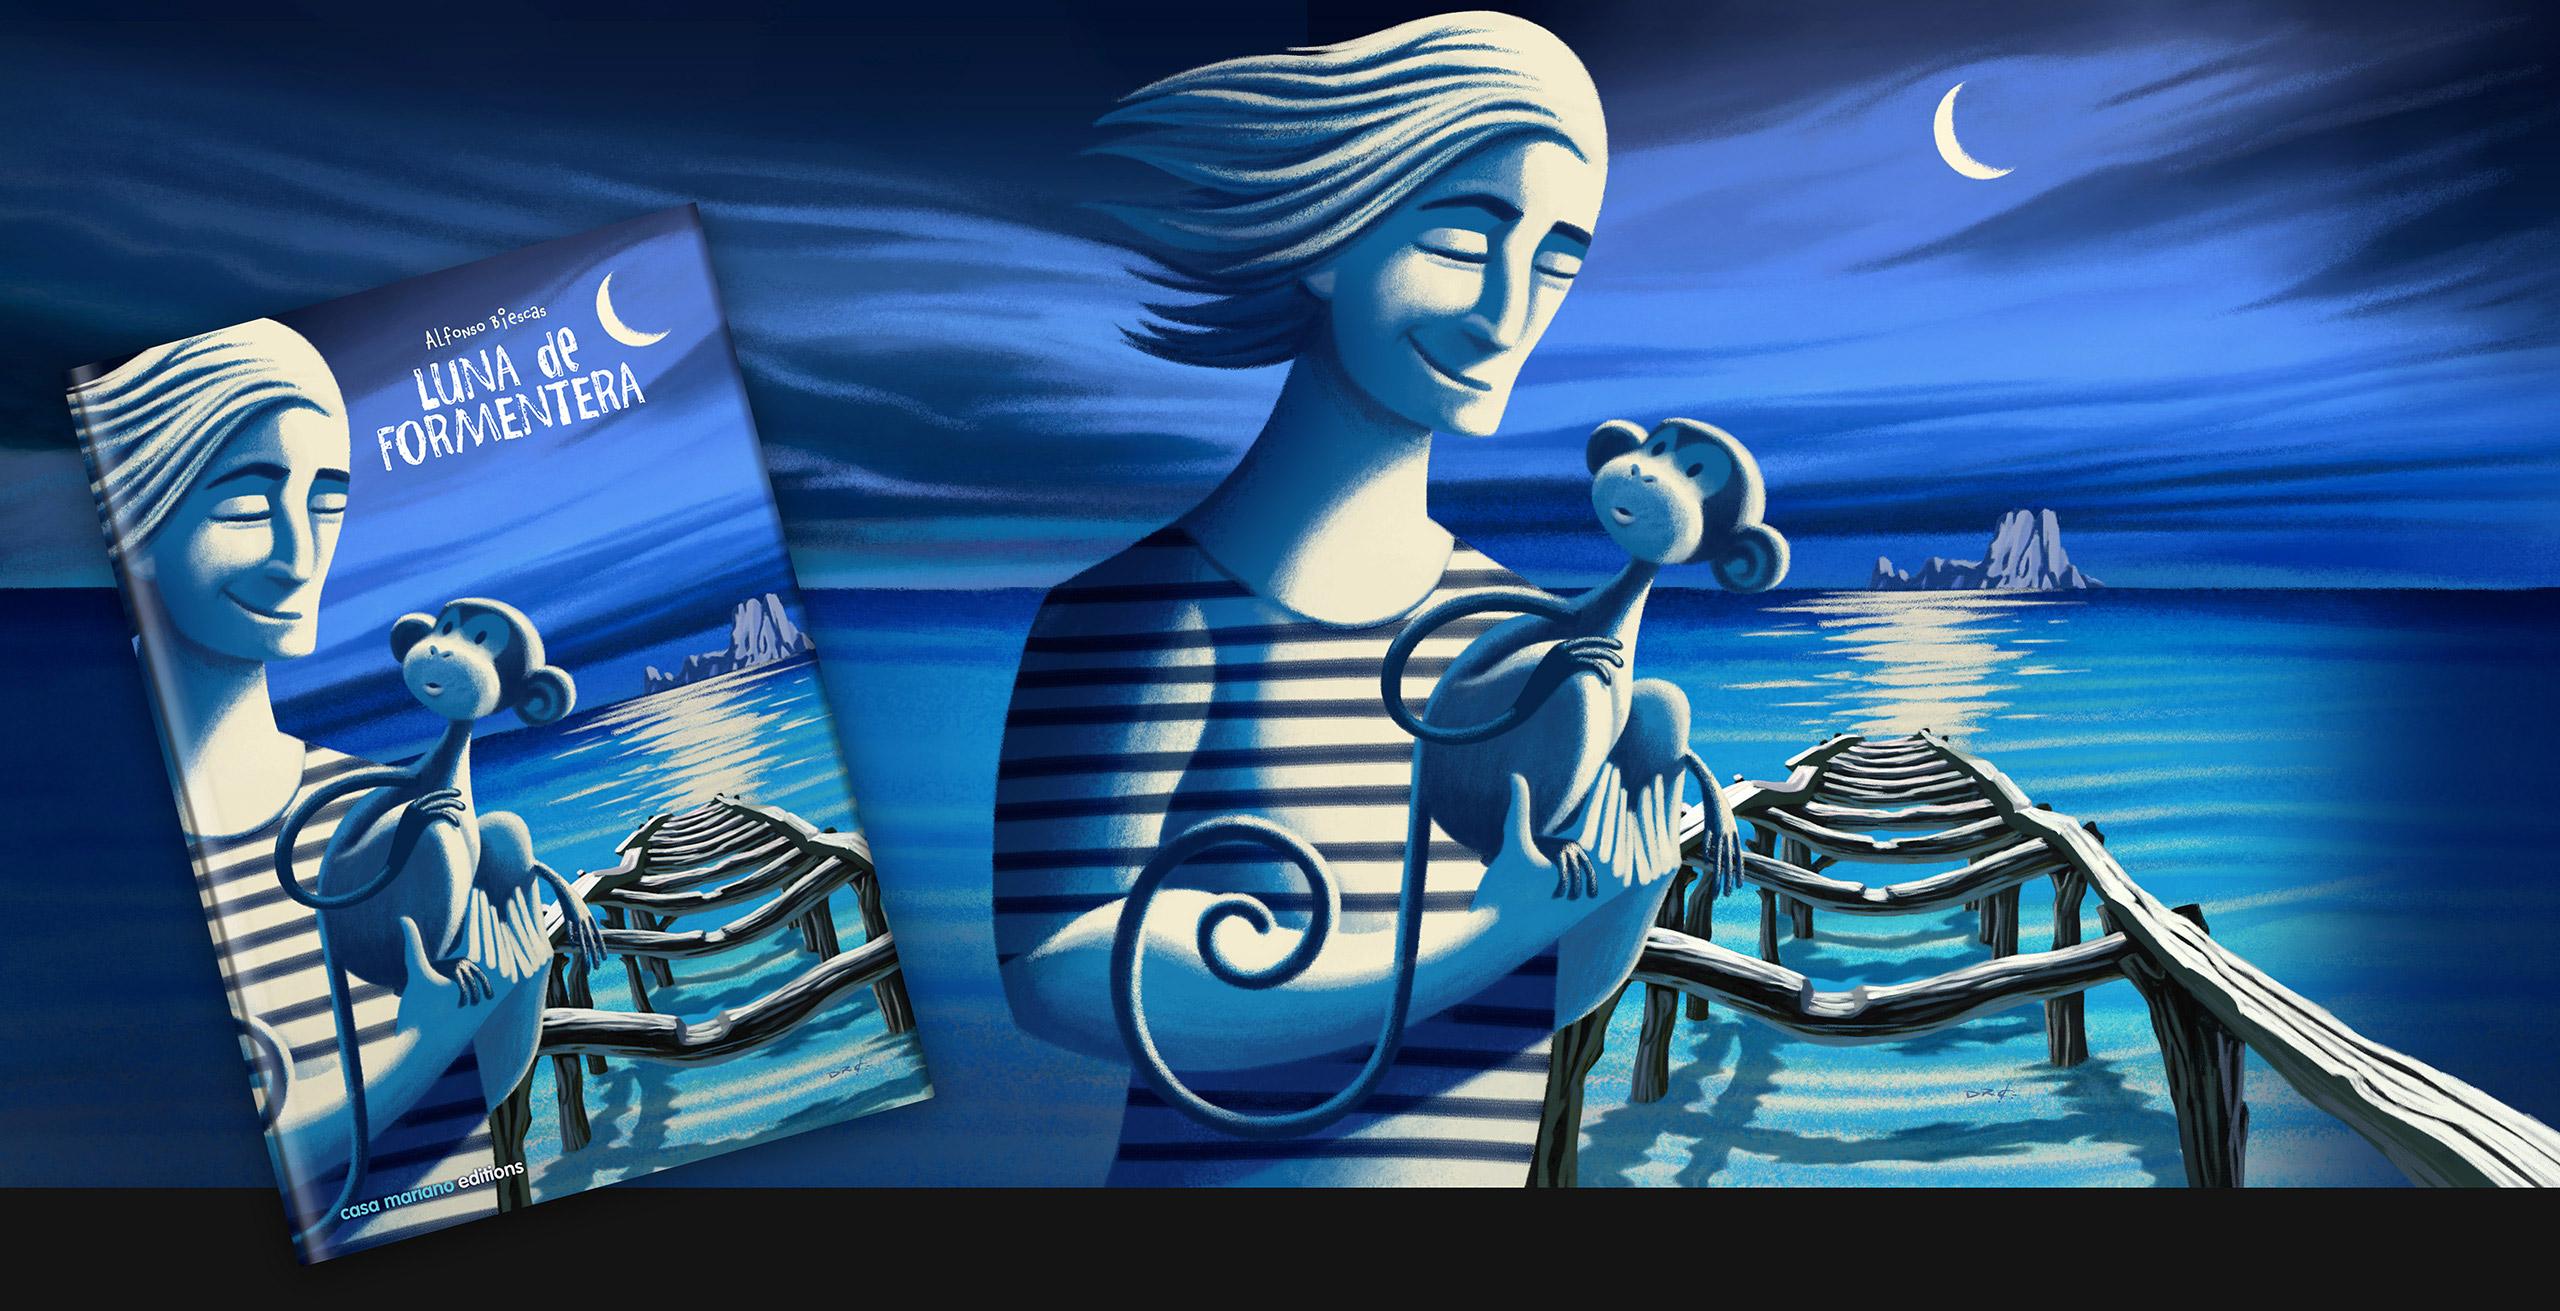 www.davidderamon.com - illustration - formentera